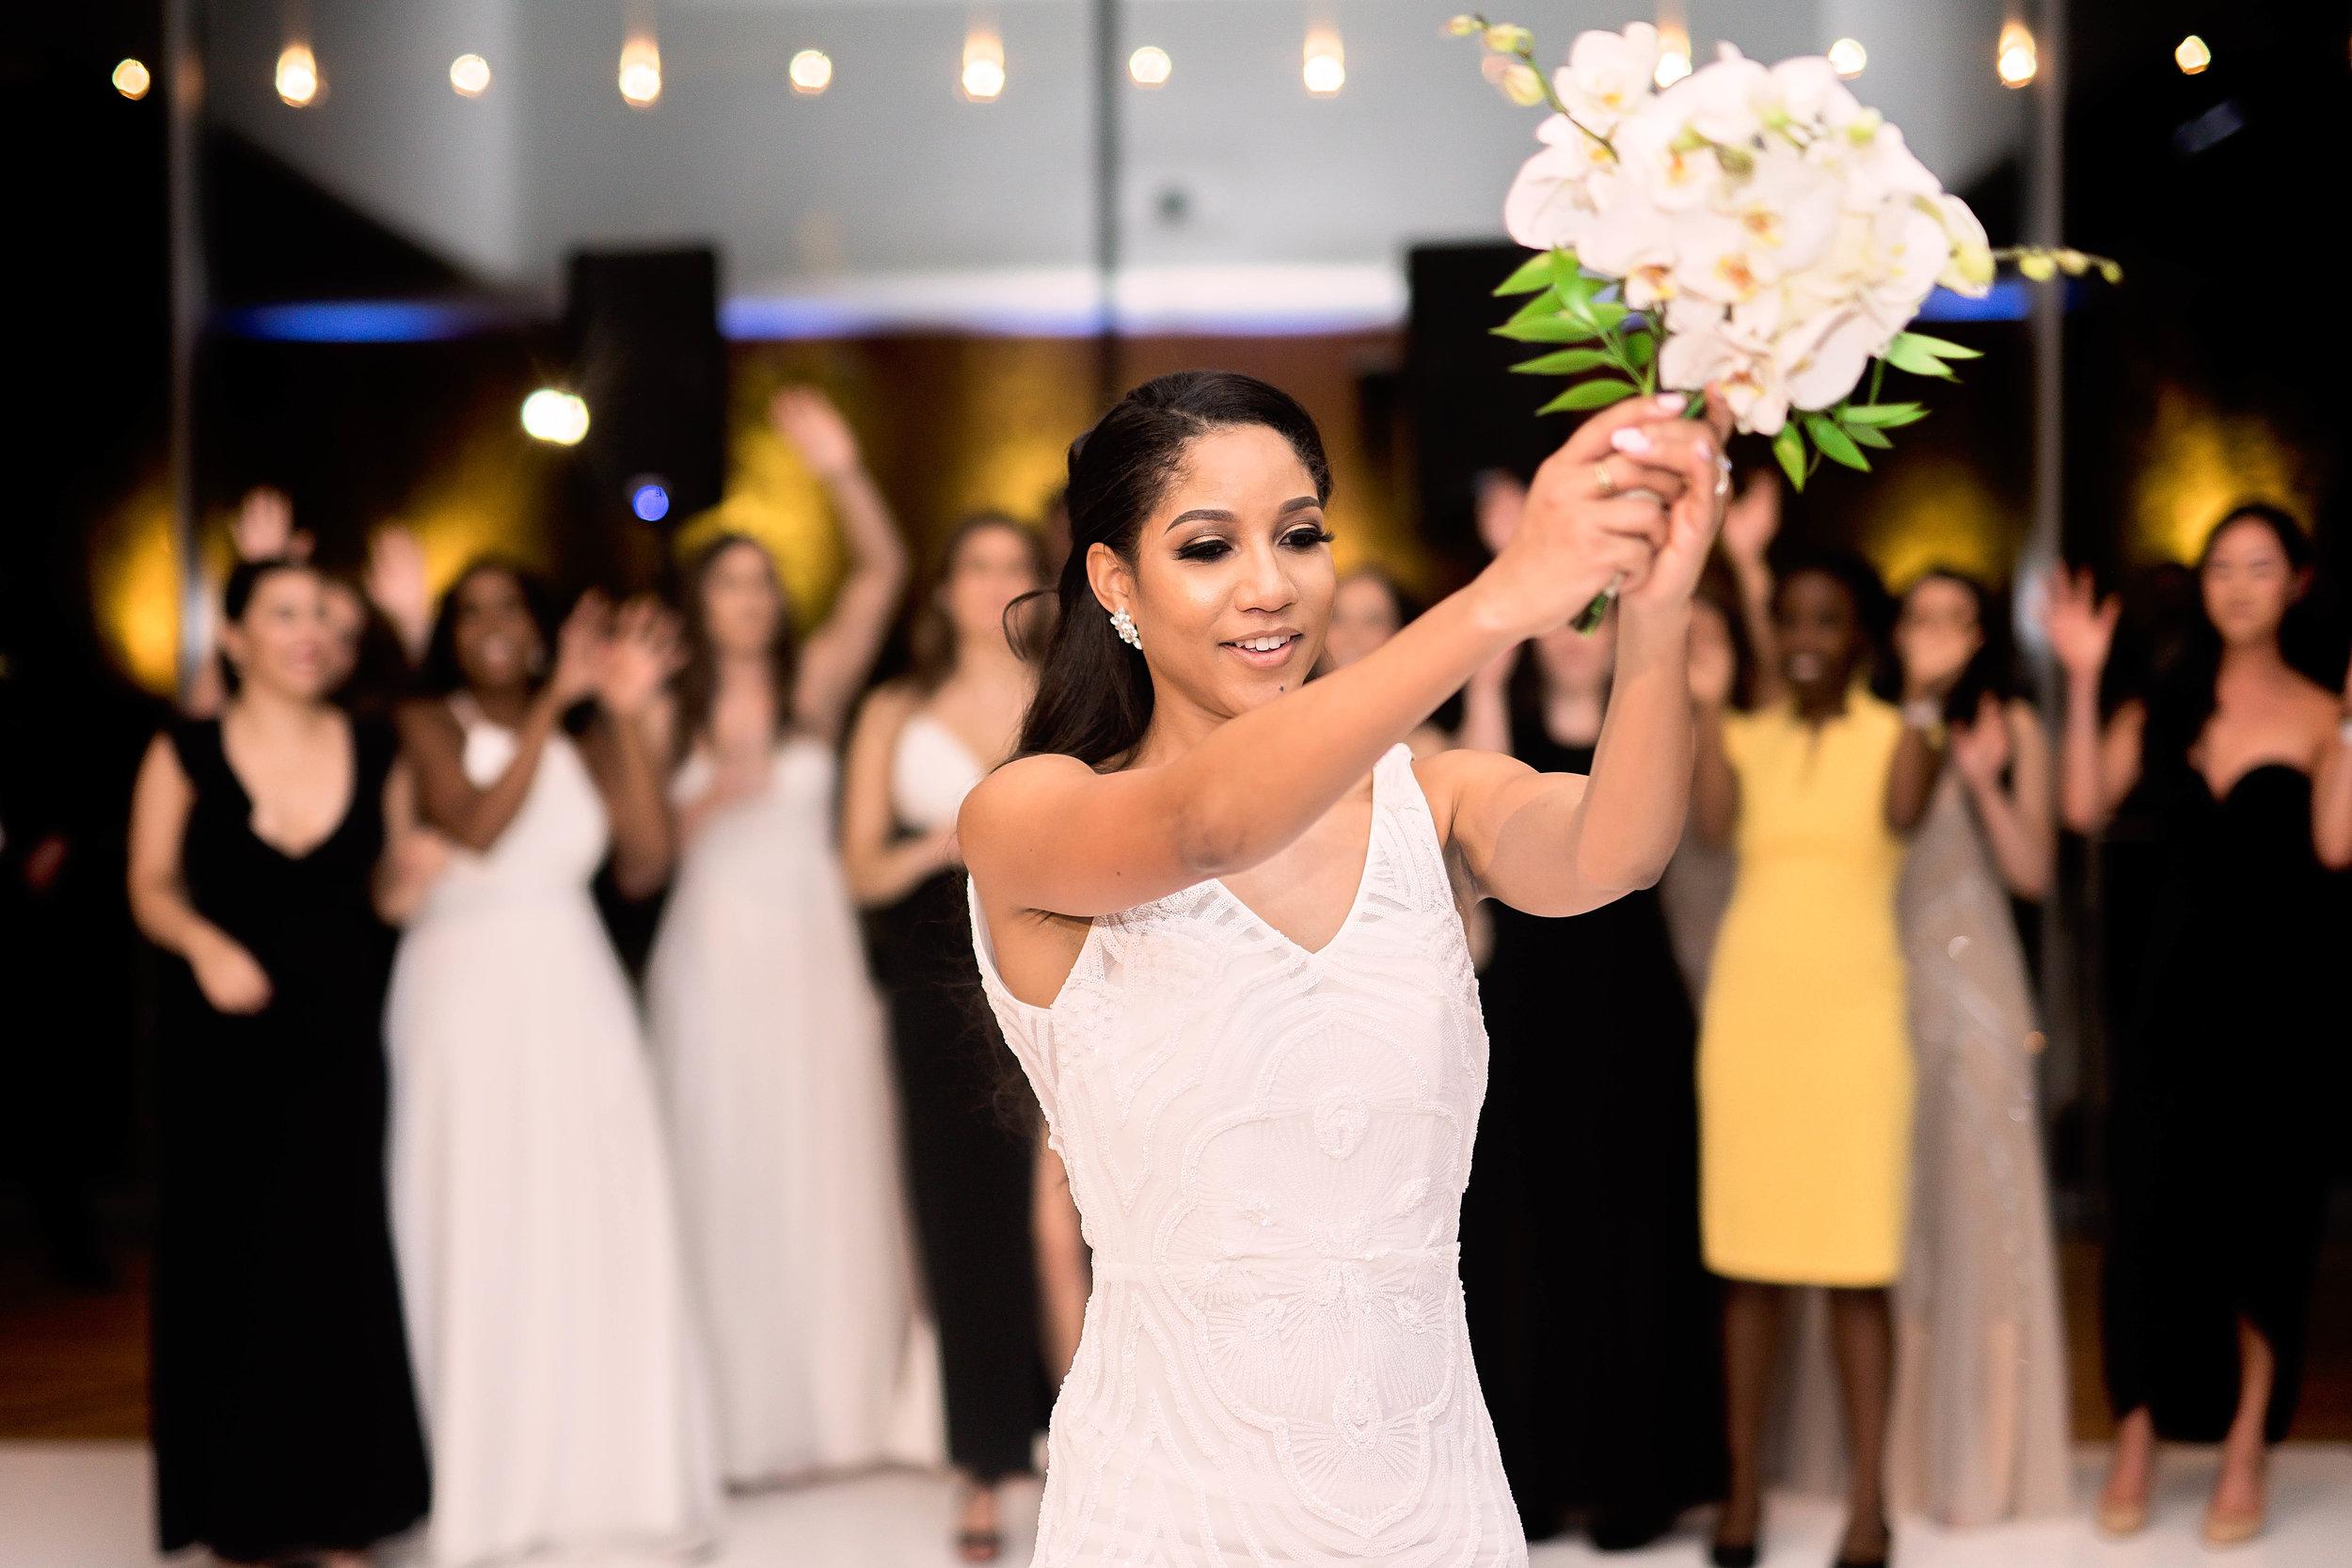 Houston Wedding- Pharris Photography- Reception- Natalie + Mark- Bouquet Toss